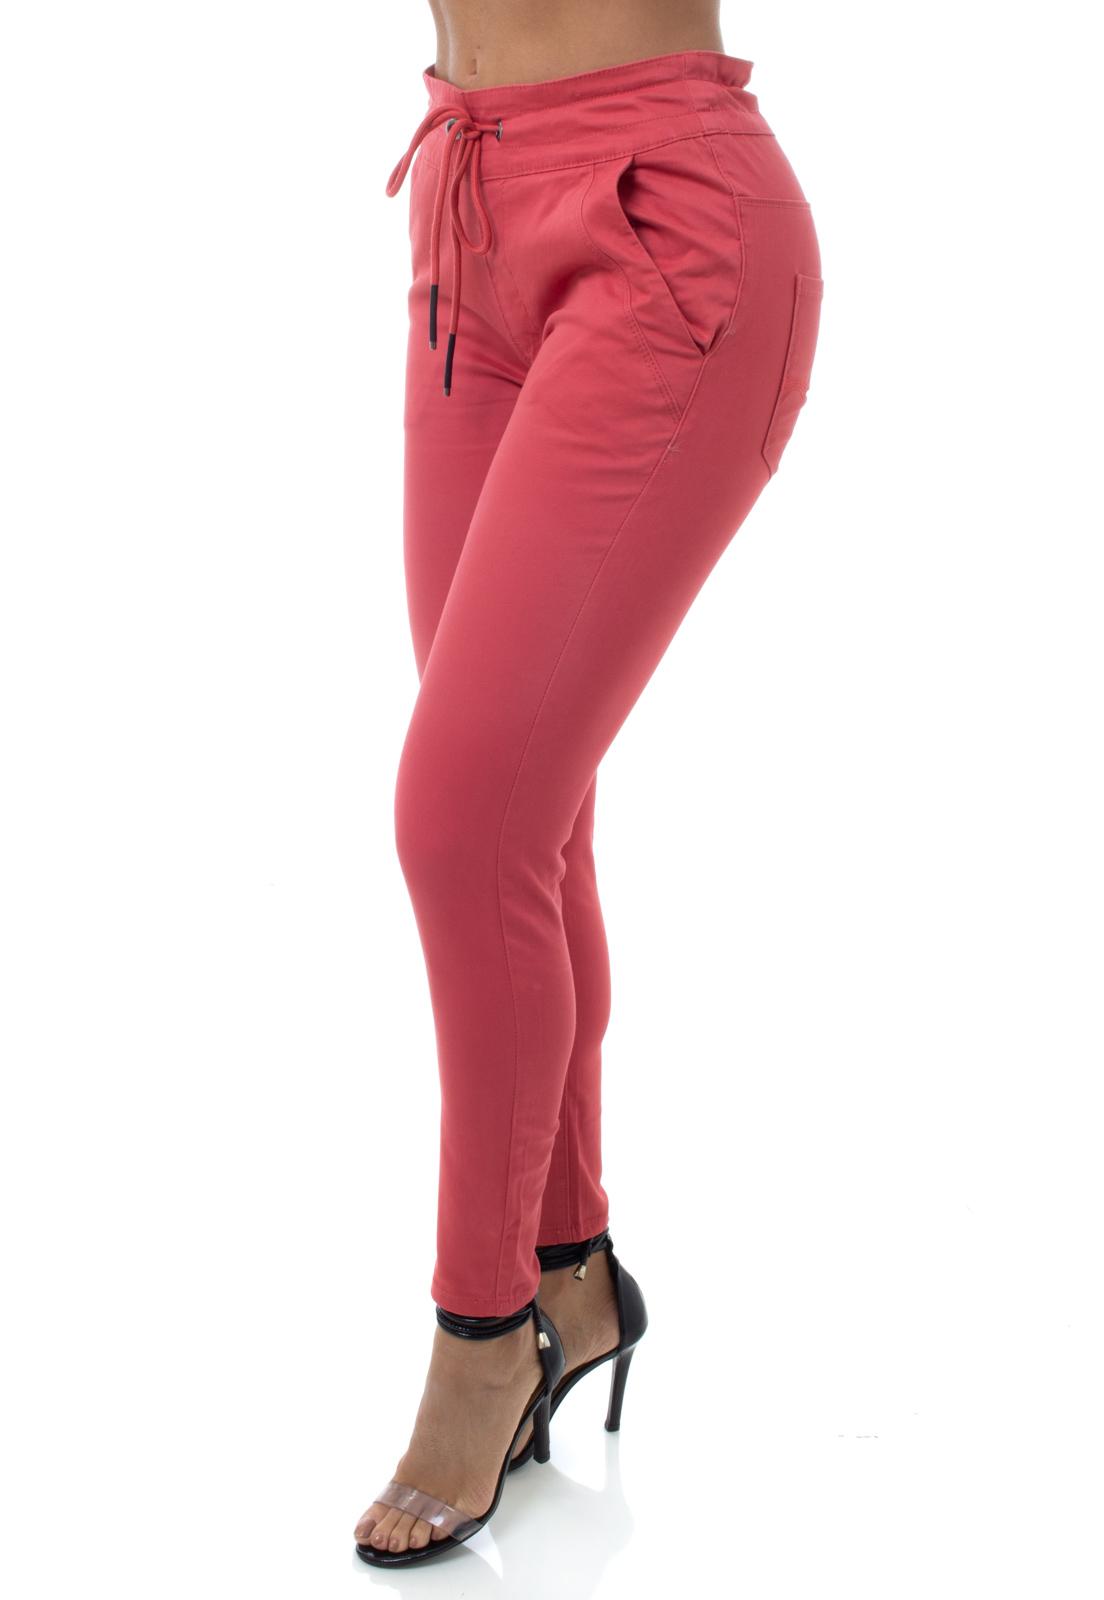 Calça Feminina Jogger Color Crocker - 47879  - CROCKER JEANS